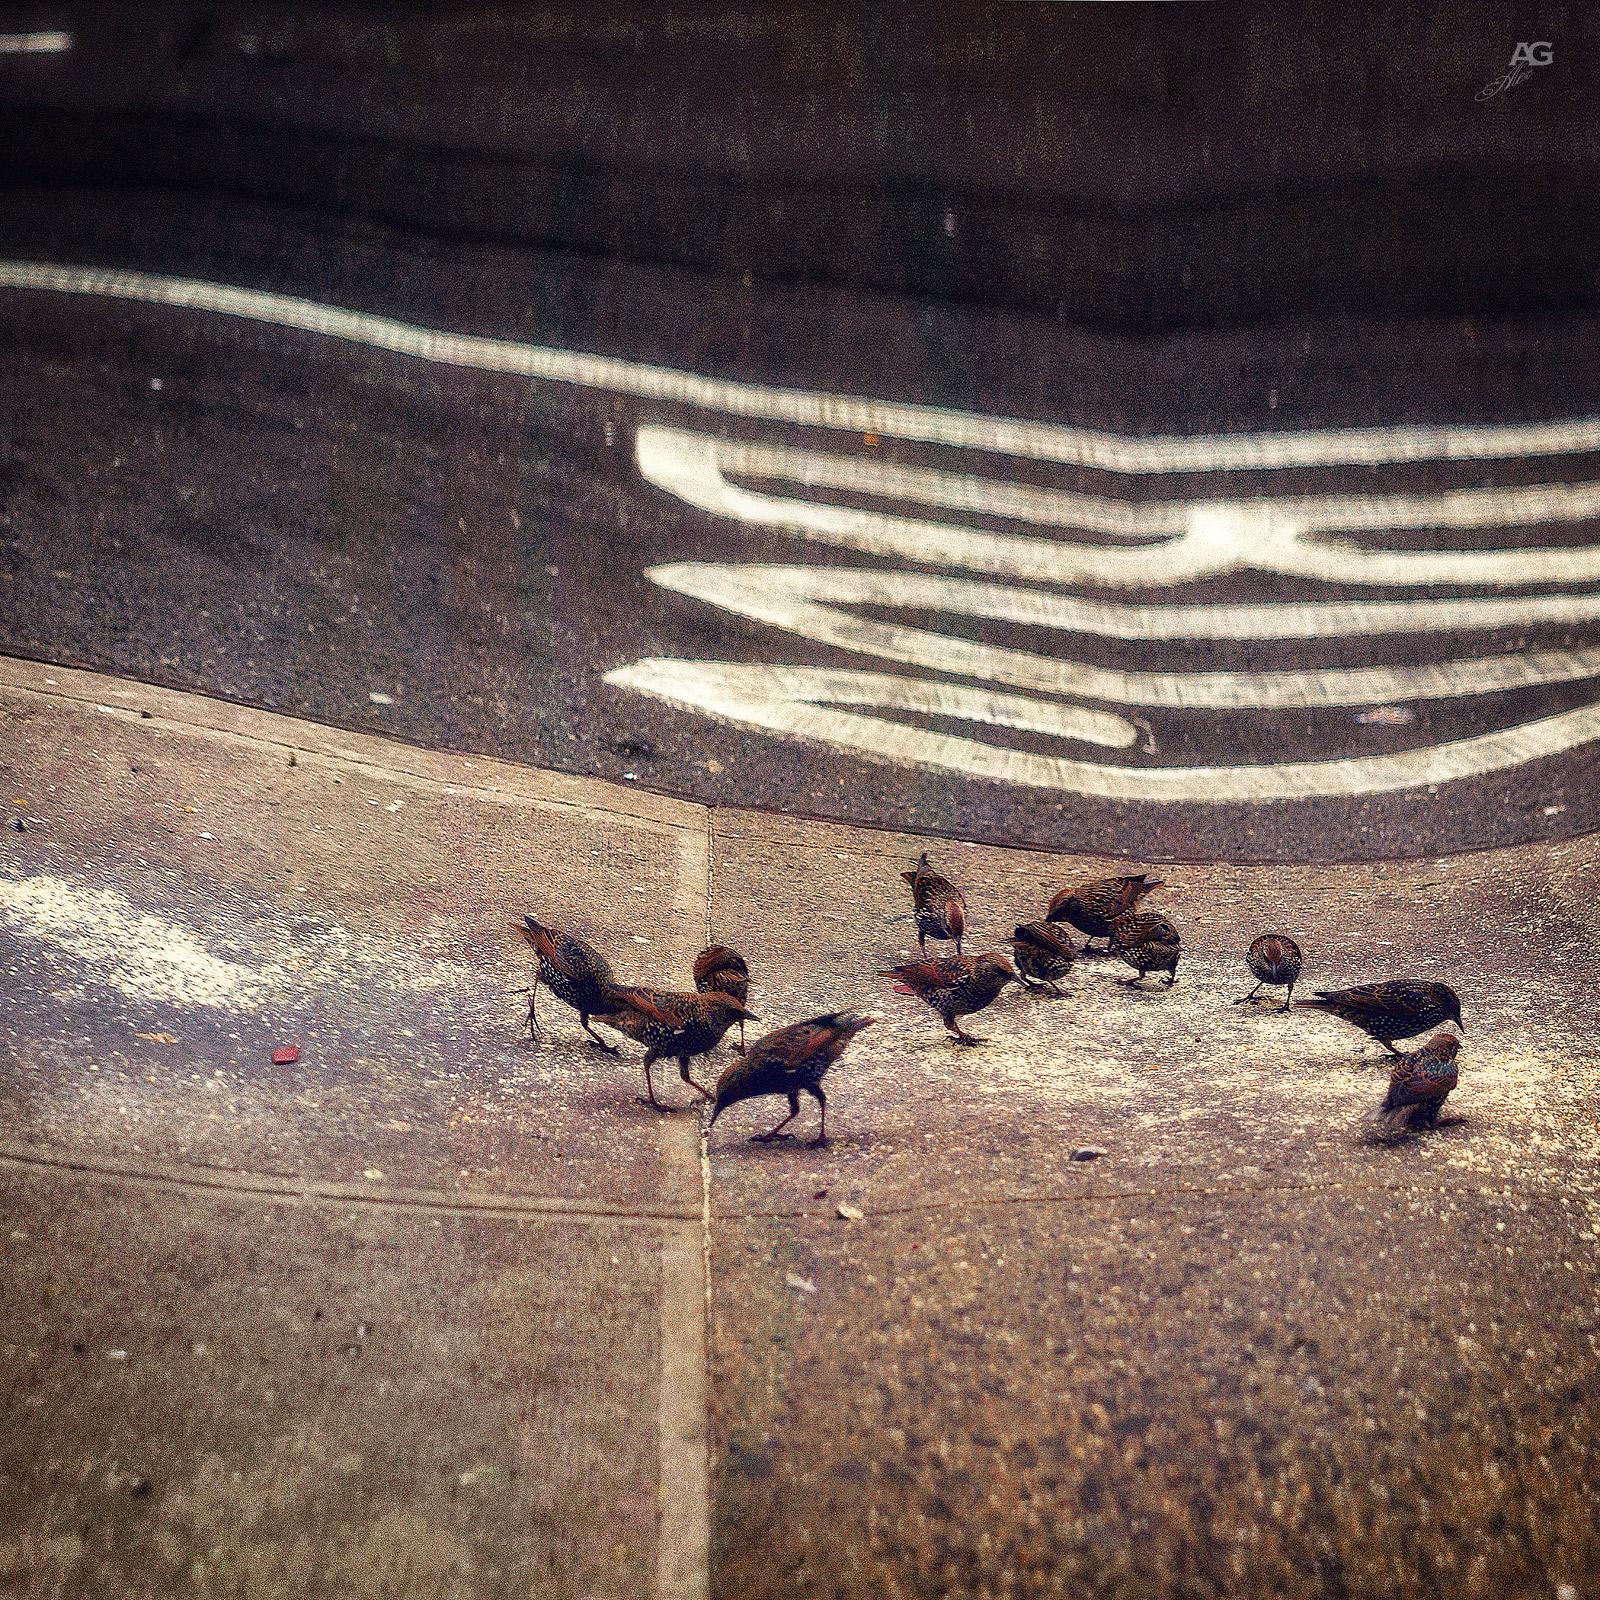 BirdsFeedingOnASidewalkOfManhattan_warped_1600